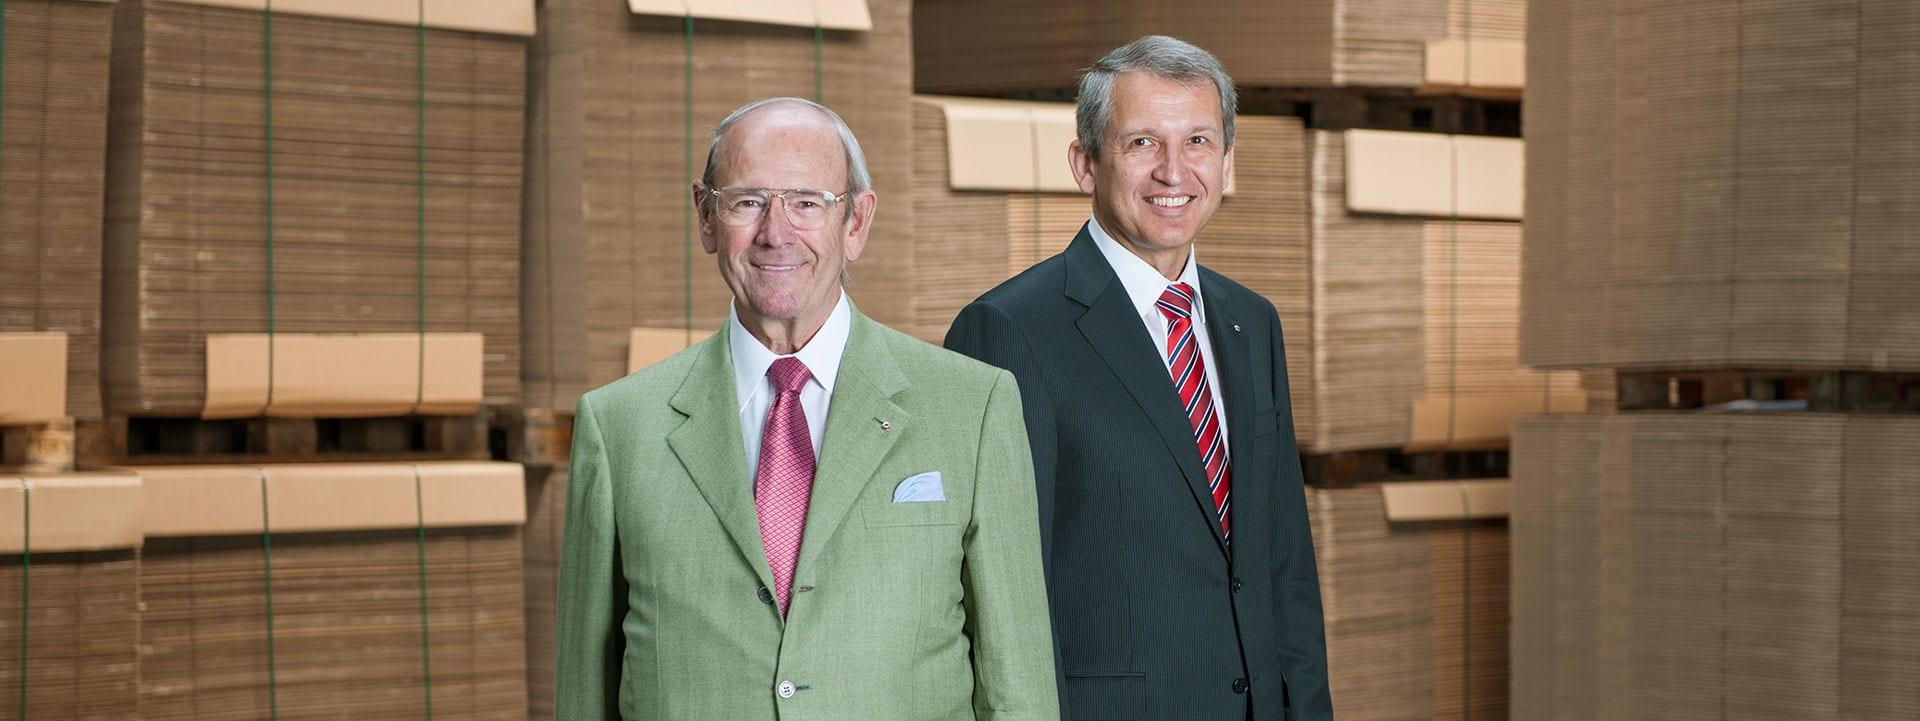 Alwin J. Kolb and Dr.-Ing. Bernhard Ruffing